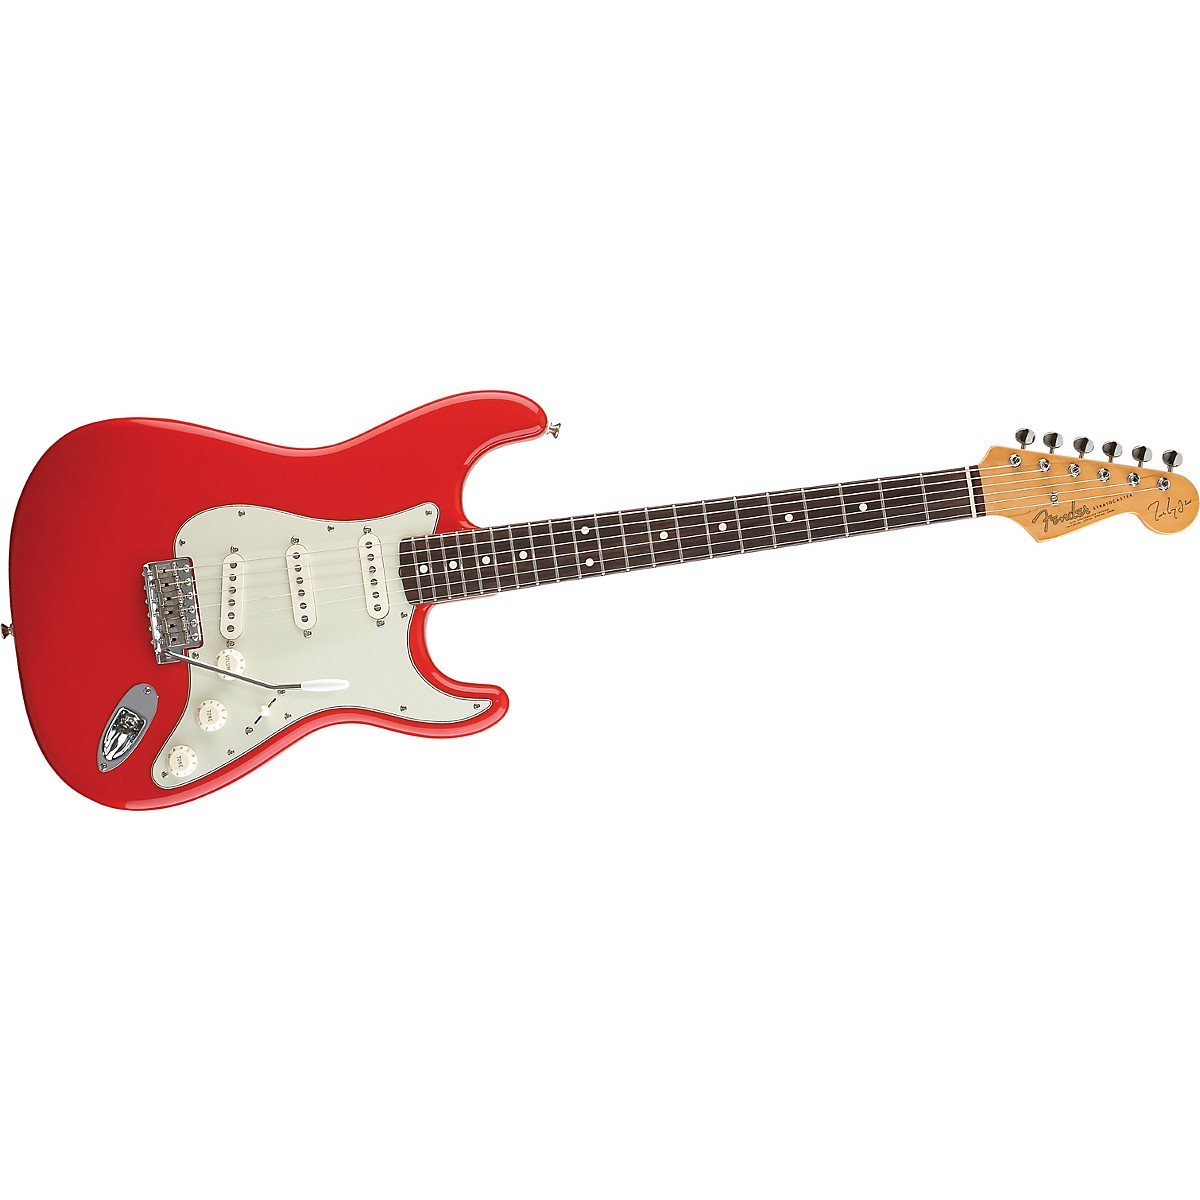 Fender Artist Series Mark Knopfler Stratocaster Electric Guitar